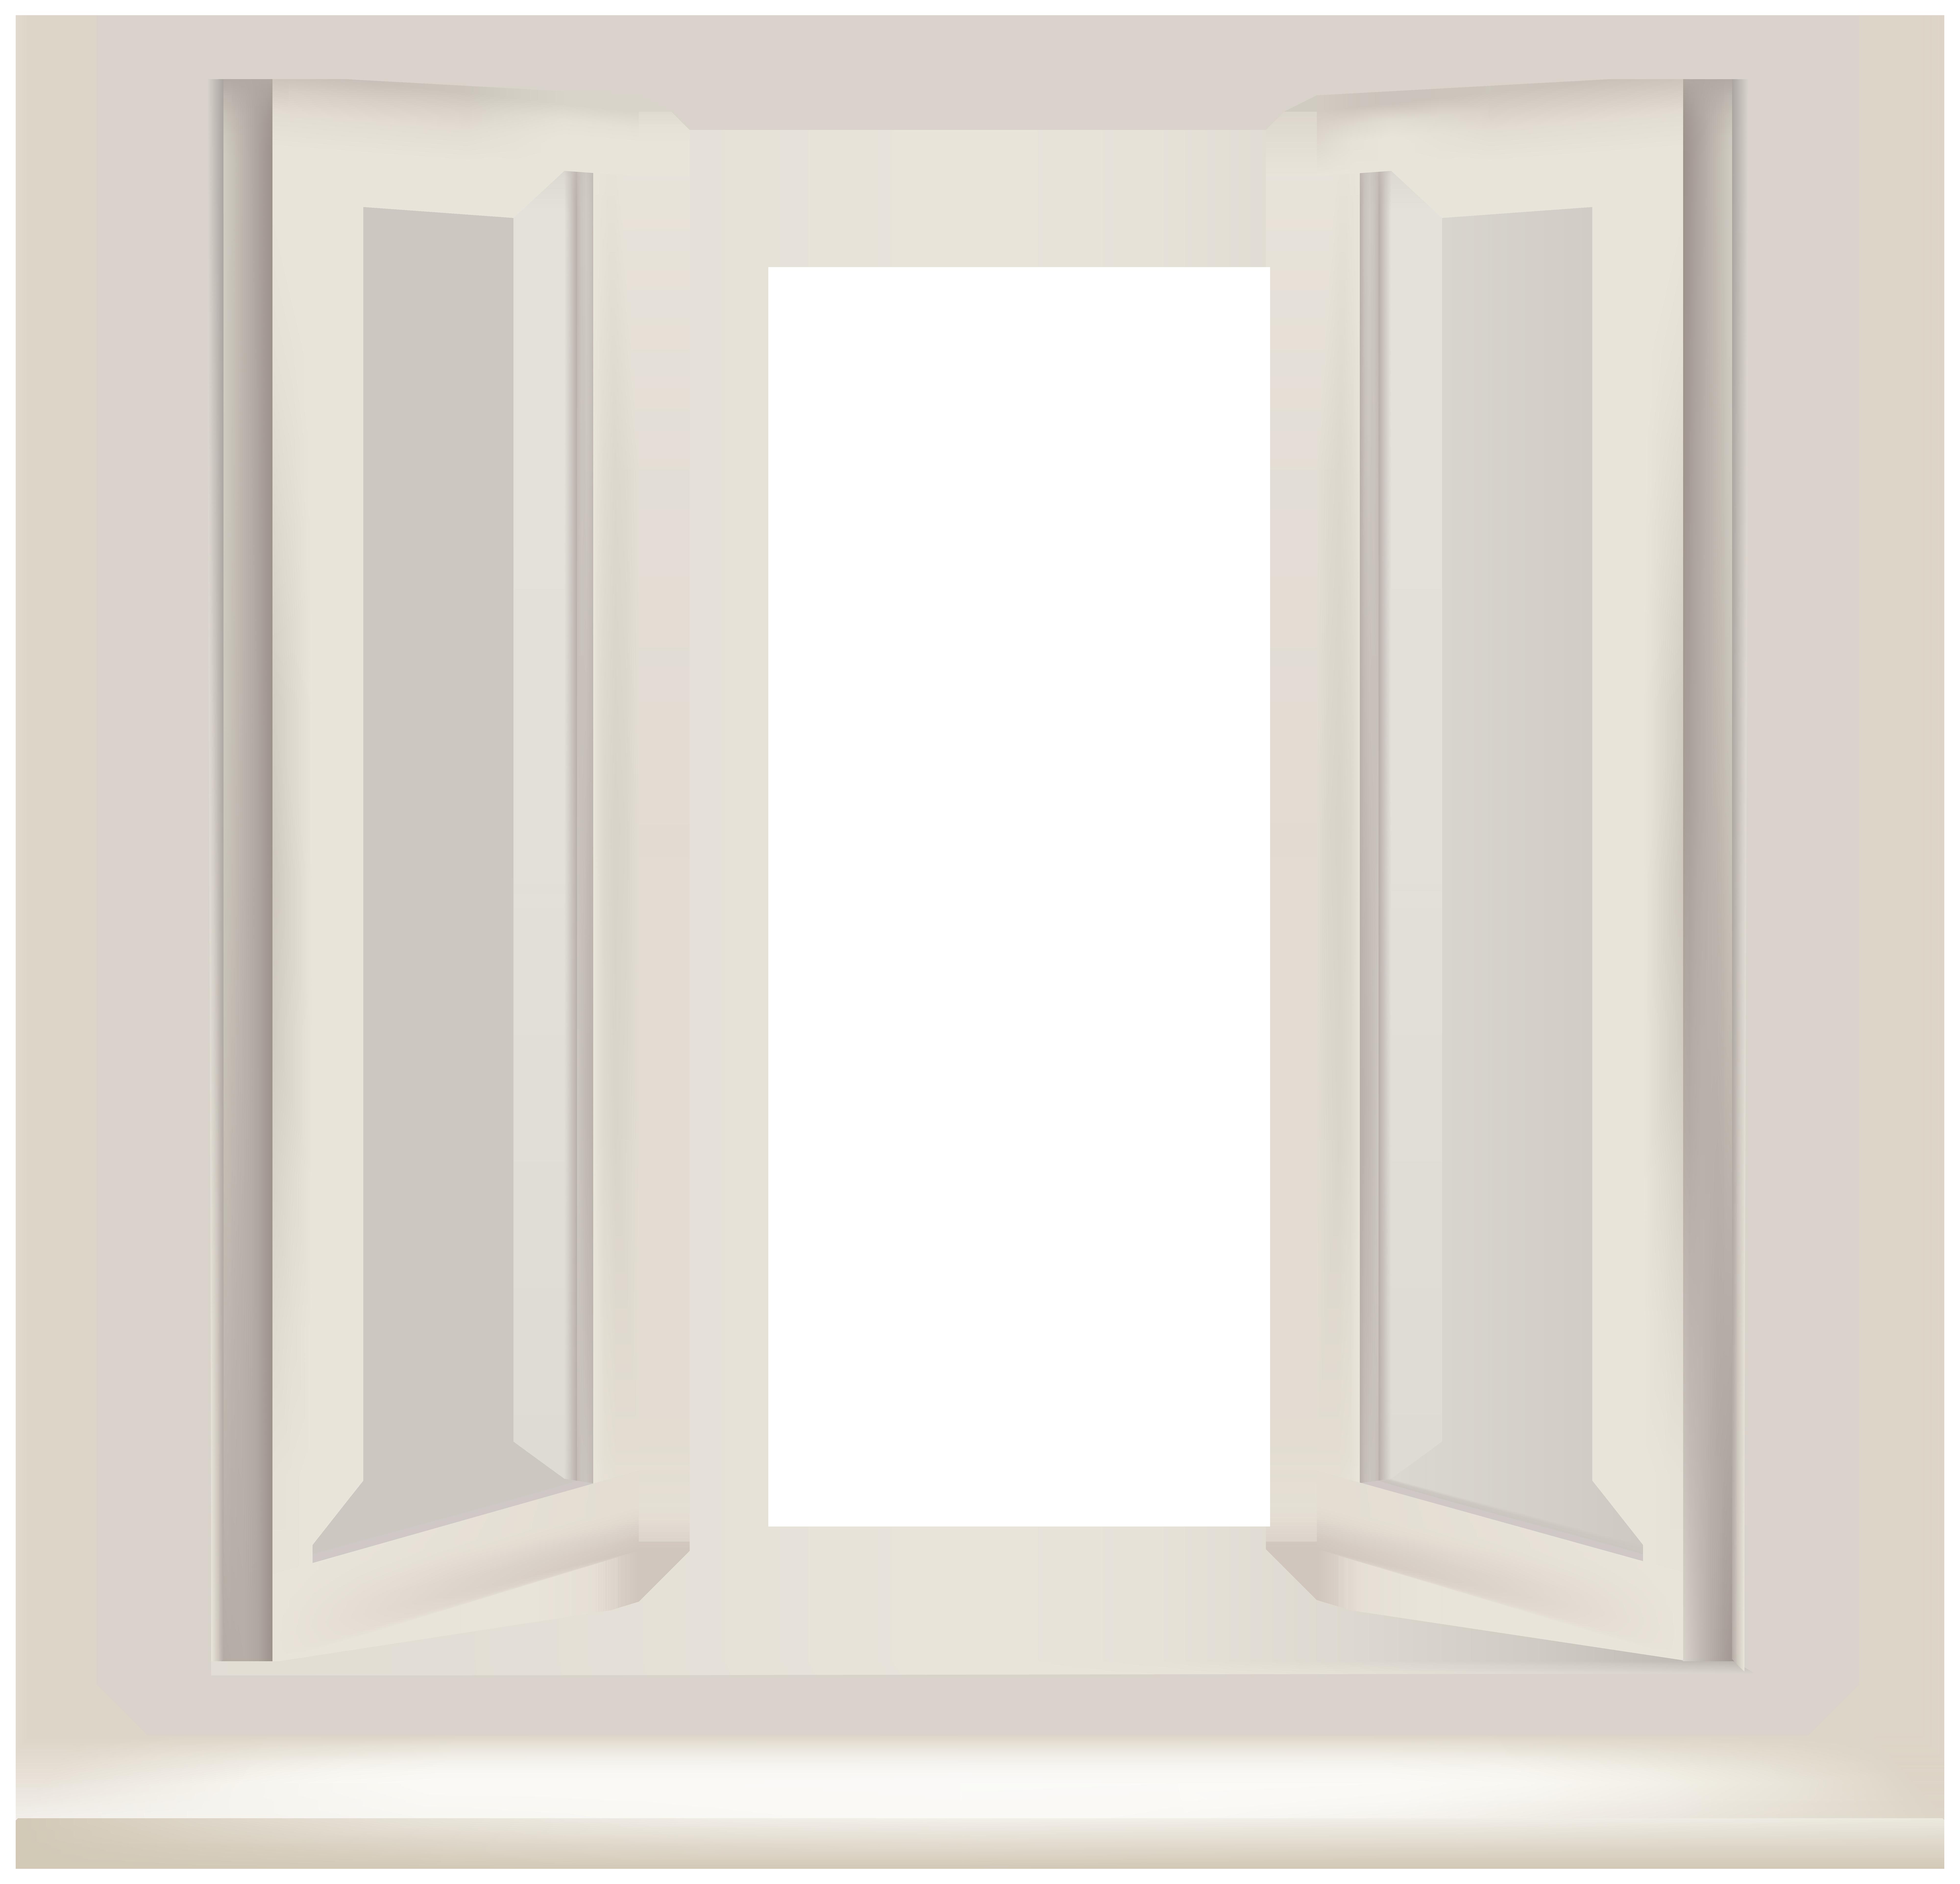 Transparent Window PNG Clip Art.